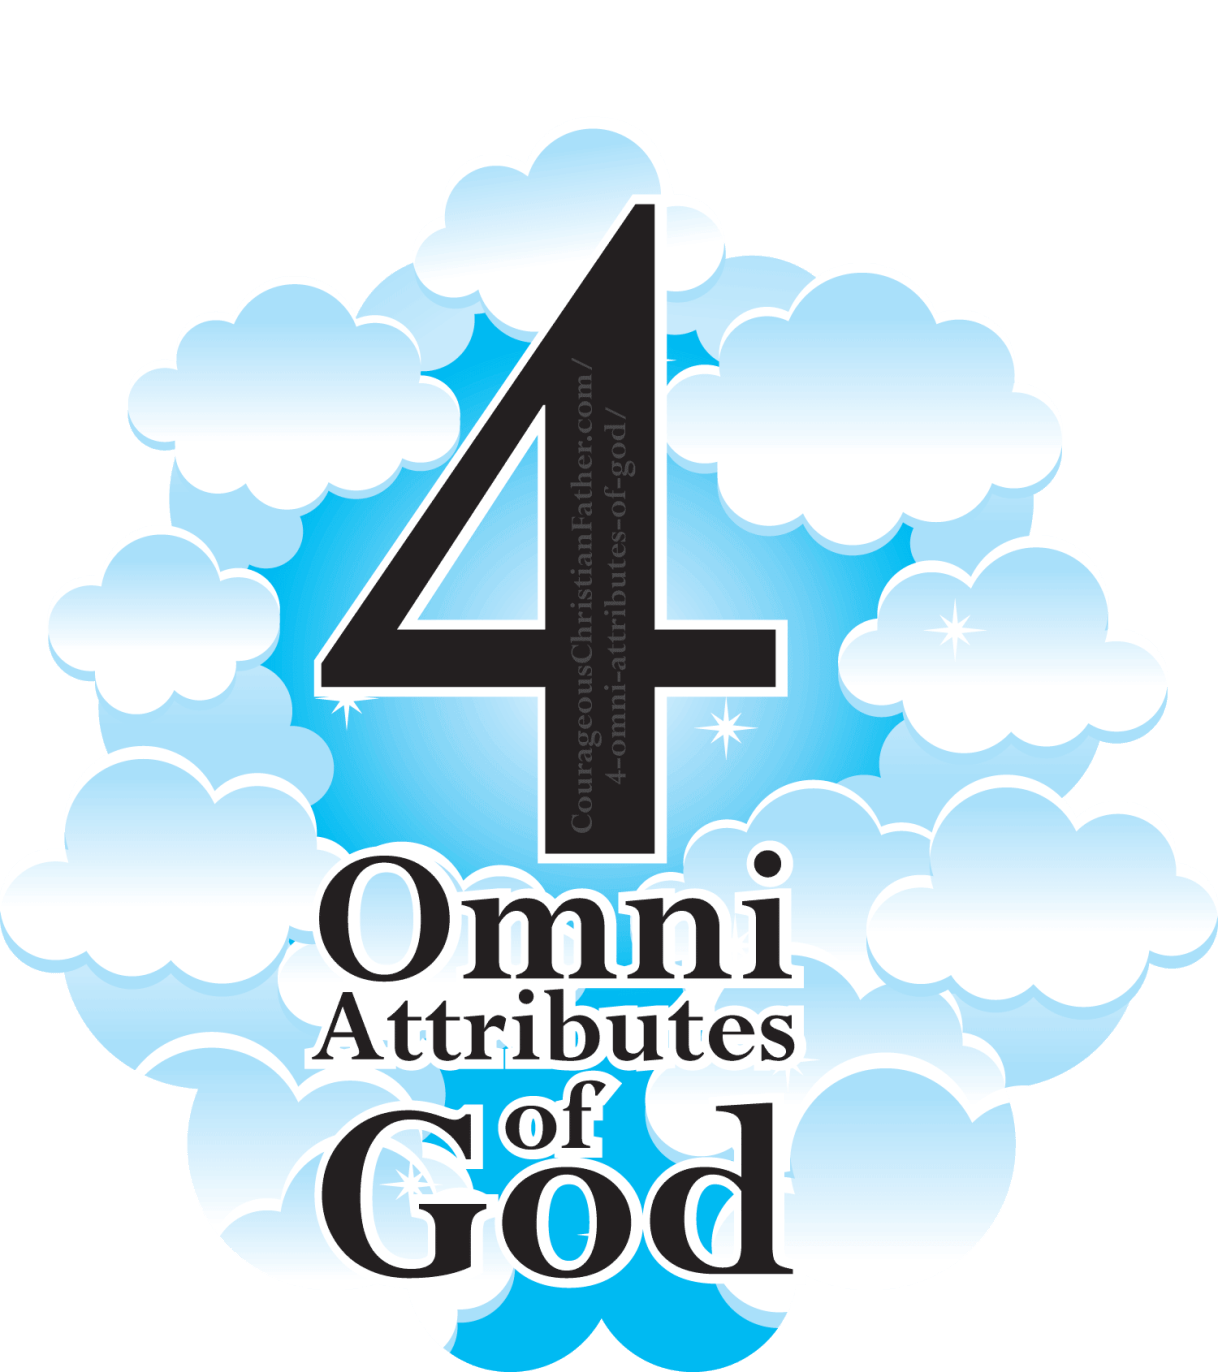 4 Omni Attributes of God